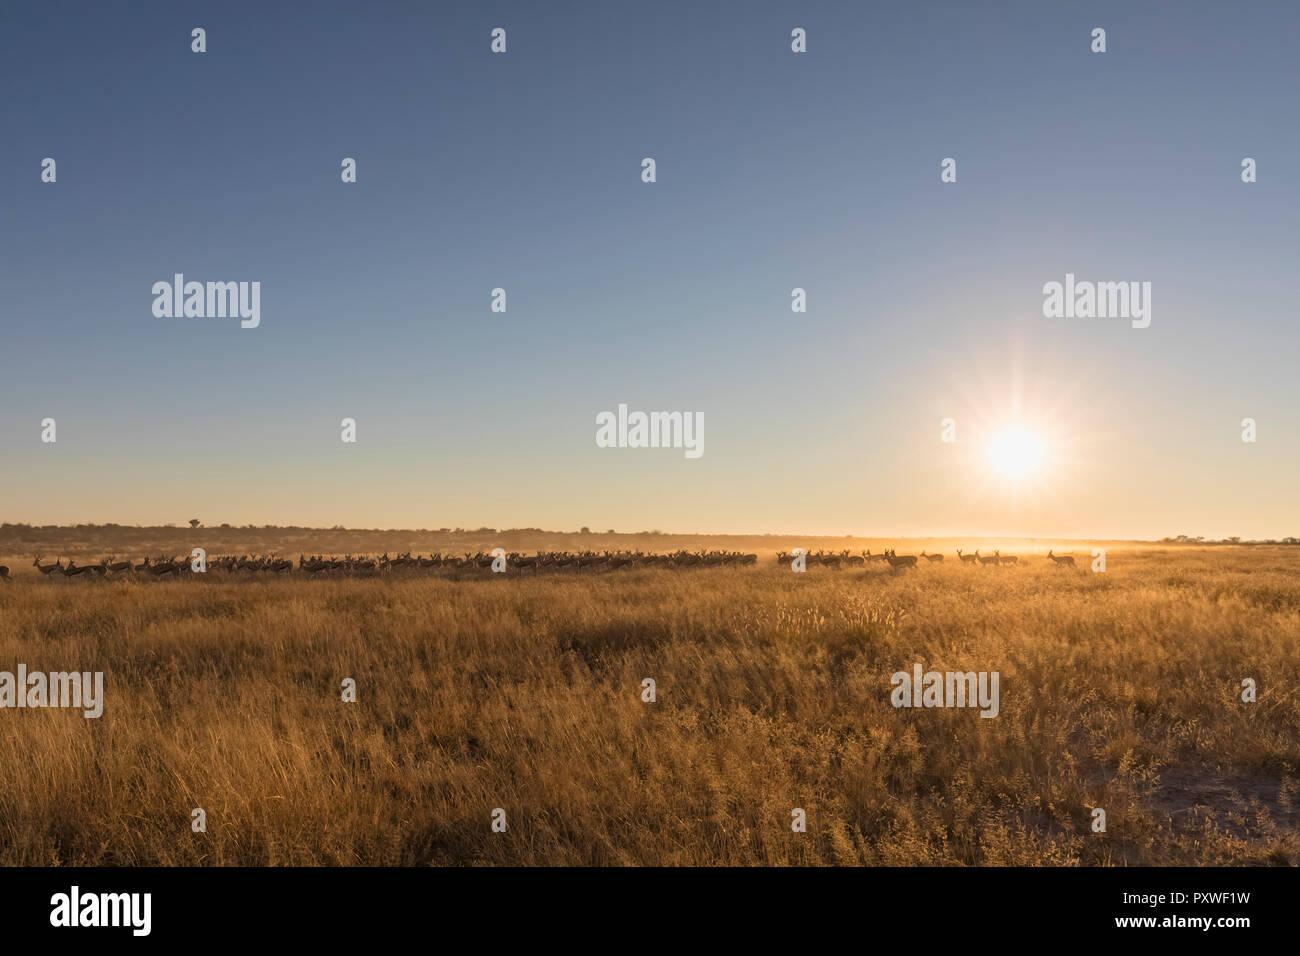 Botswana, Kalahari, Central Kalahari Game Reserve, - Stock Image